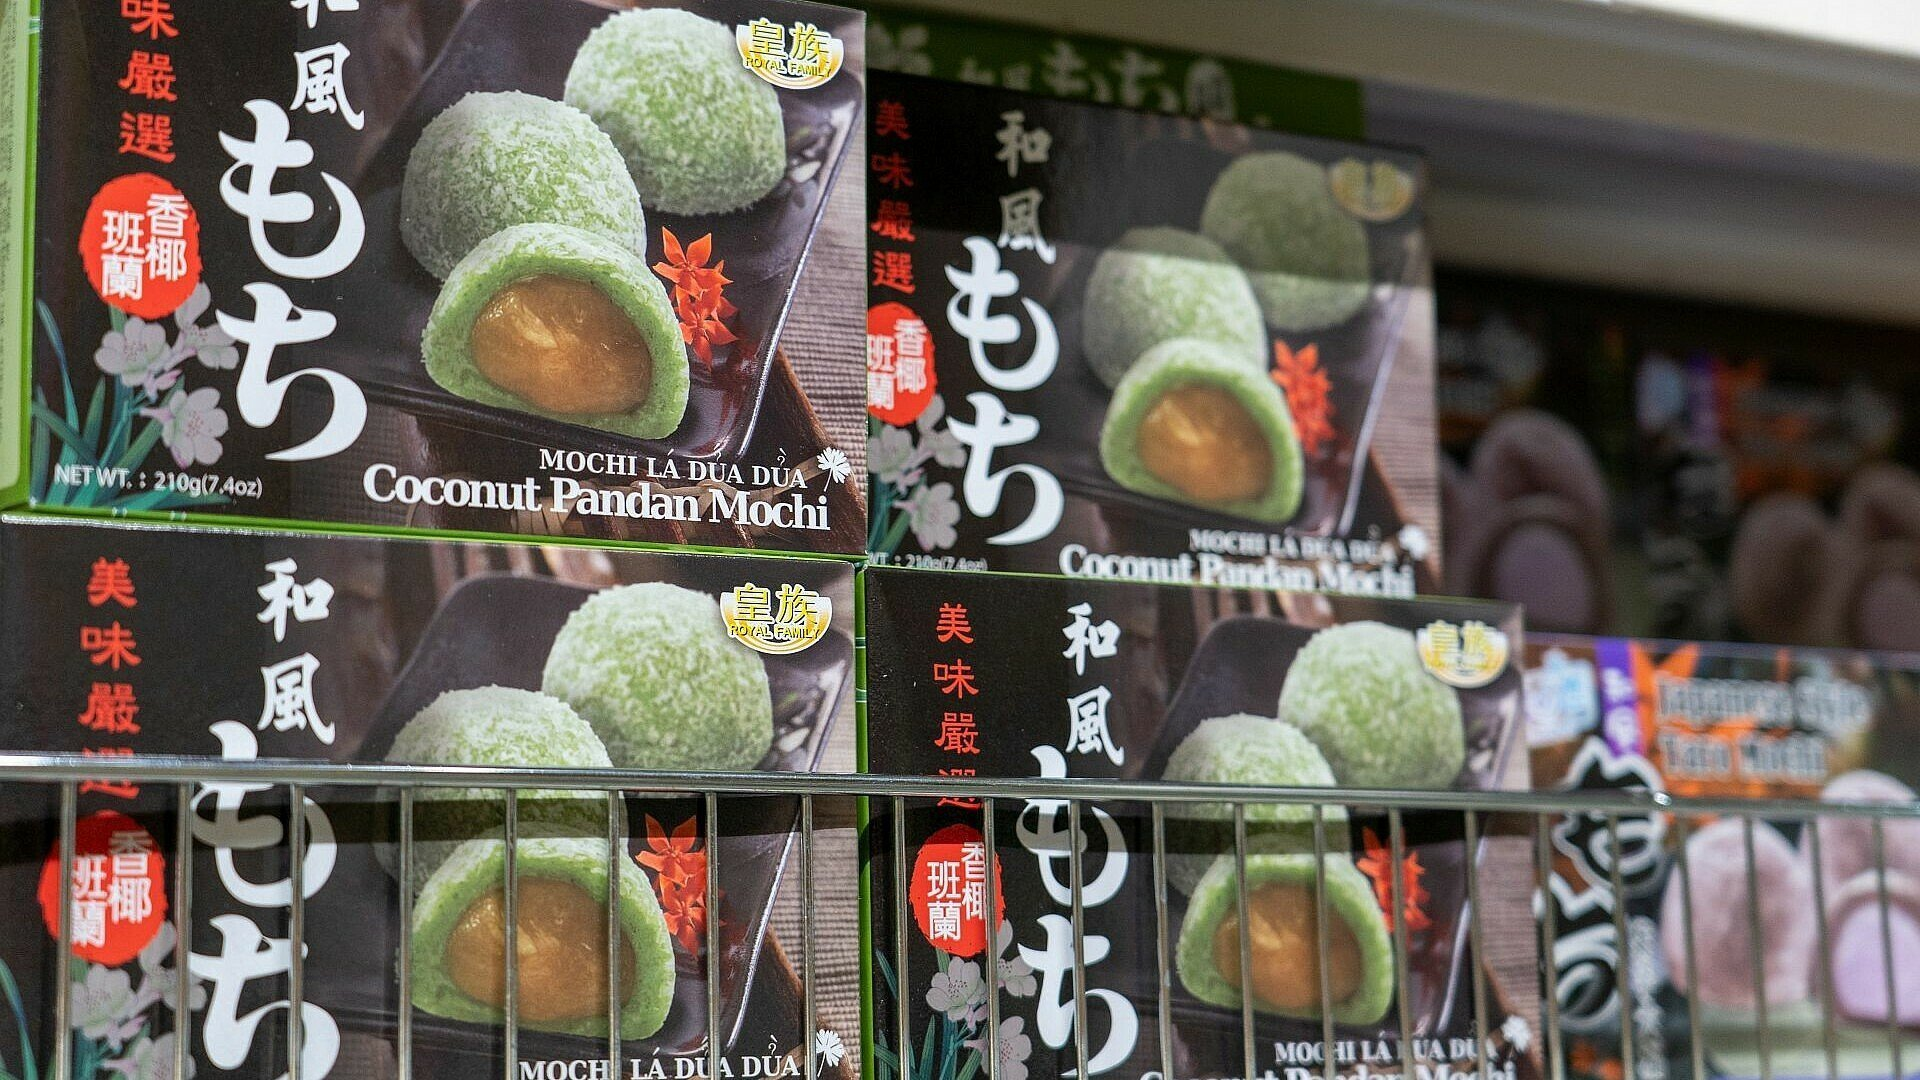 Mochi im Heng Long Asia Supermarkt in Lindenthal